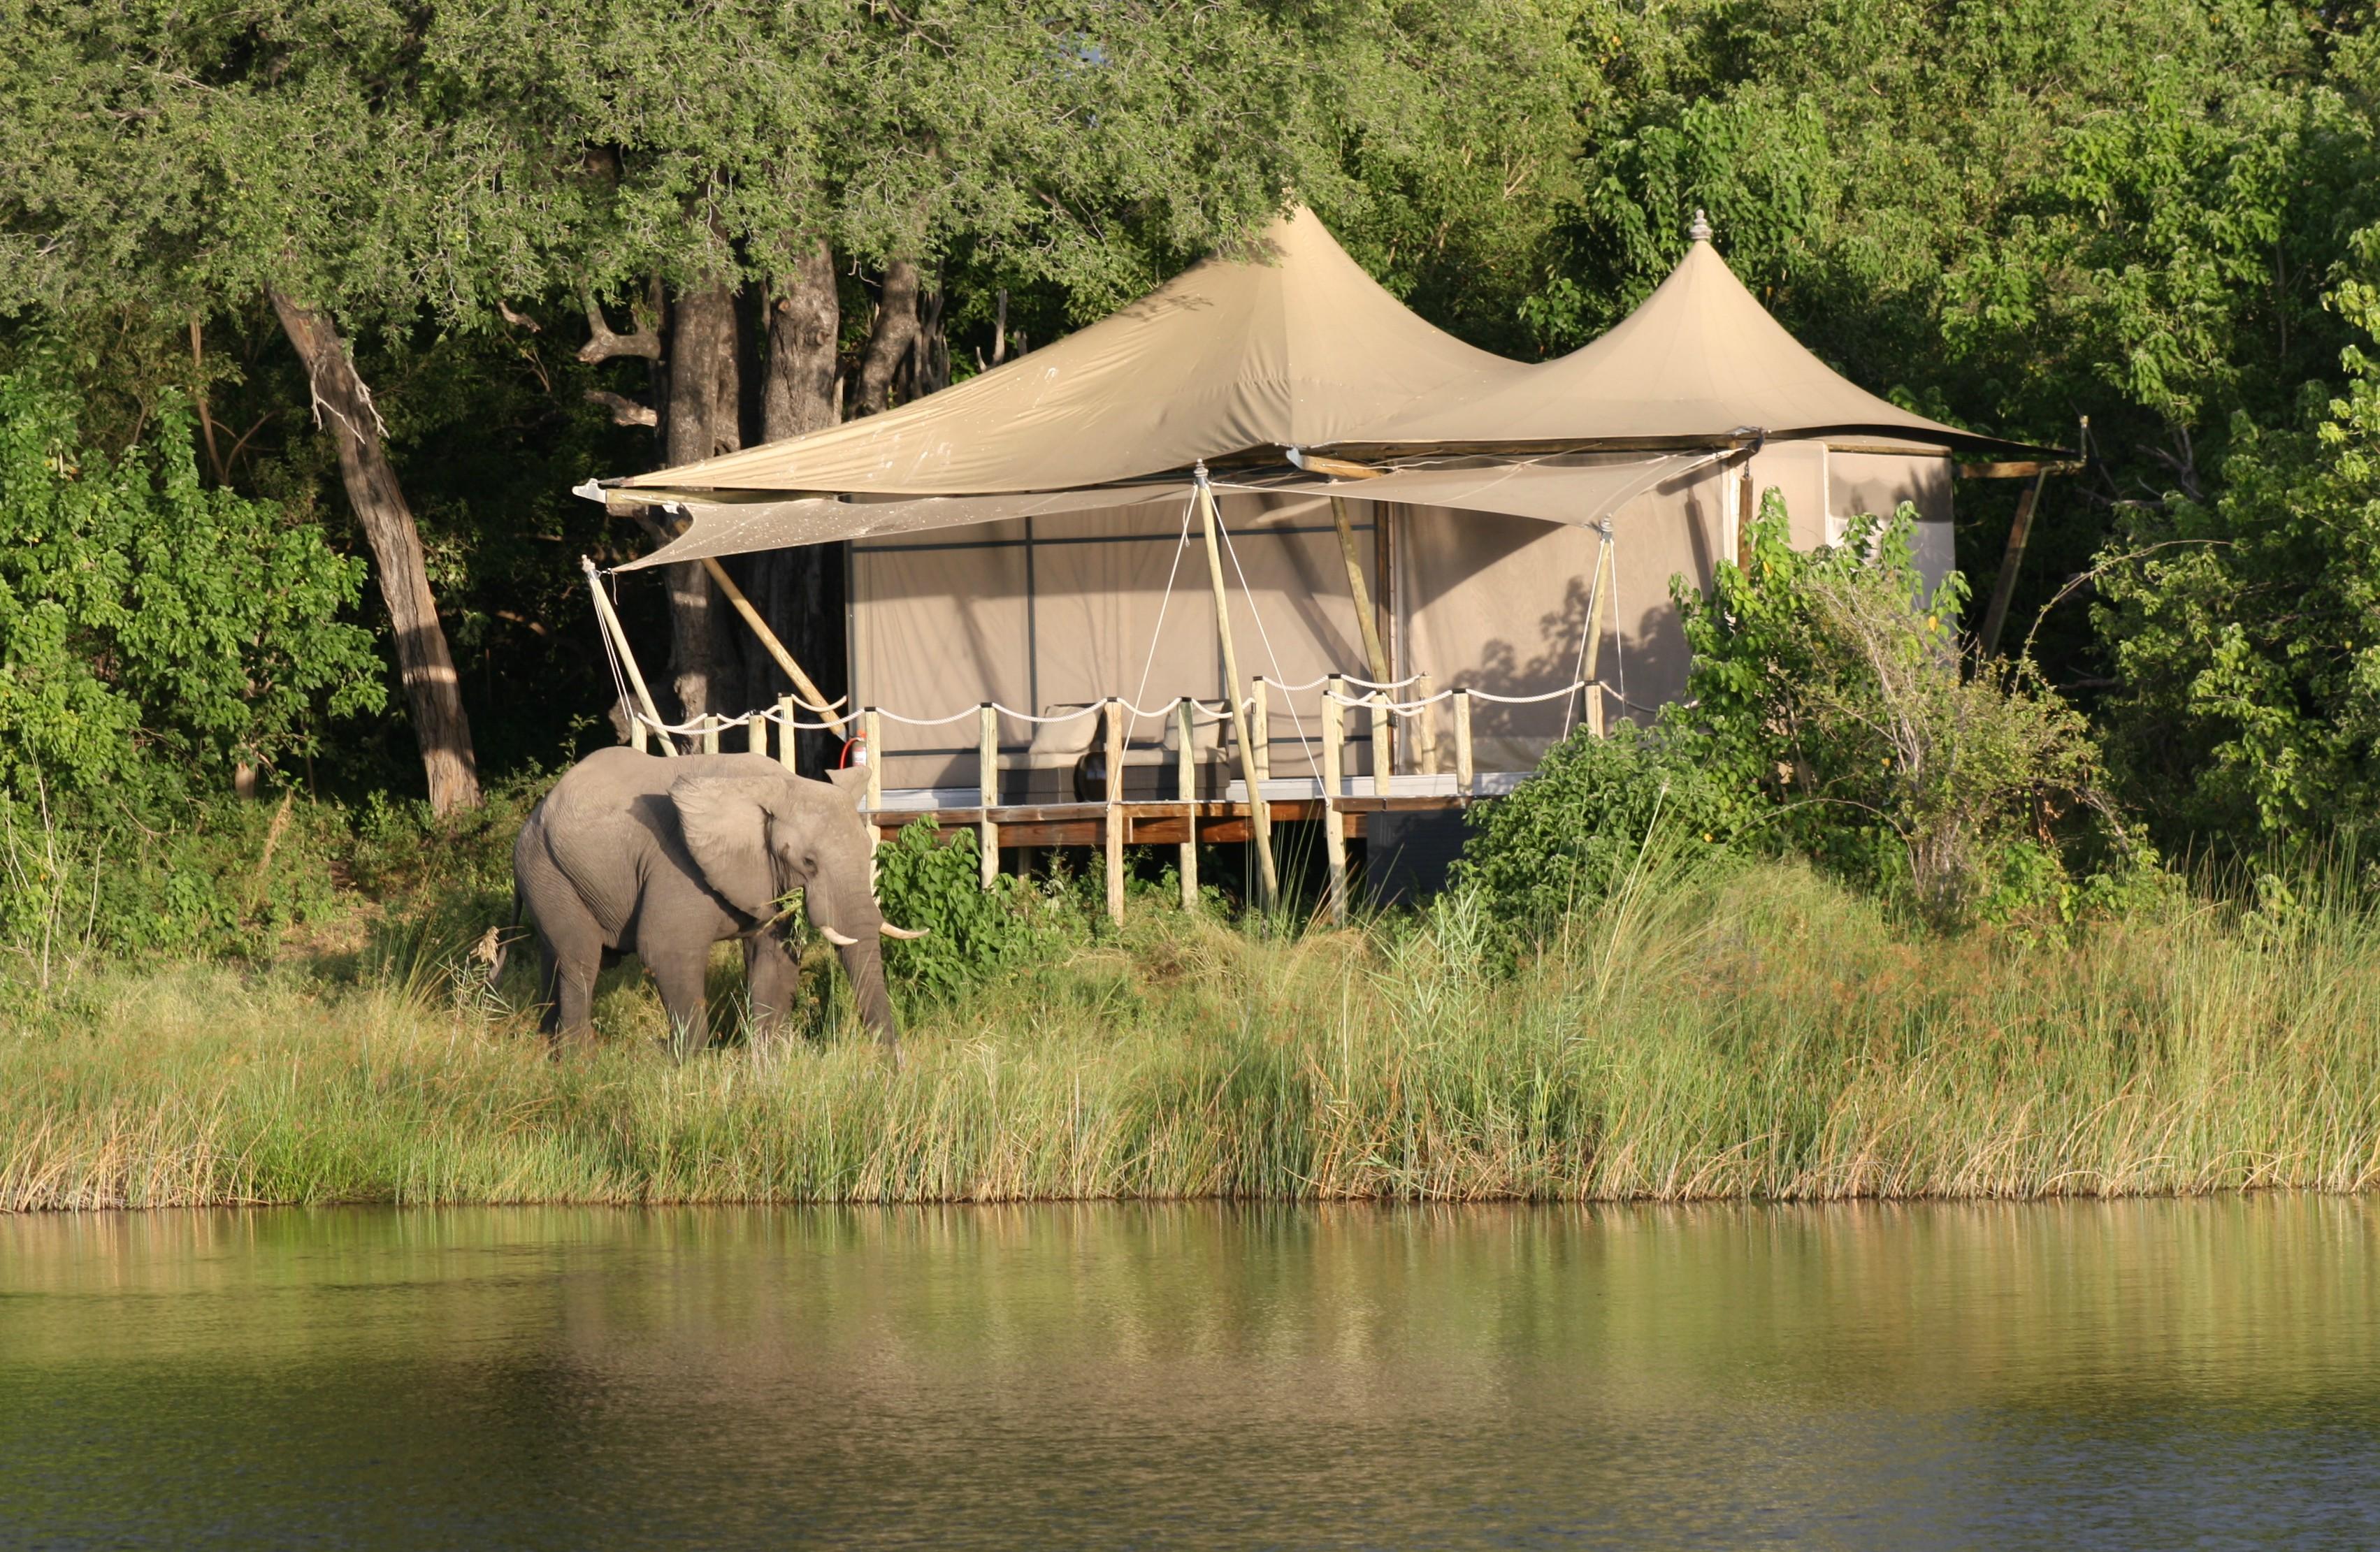 Safari camp tent with elephant tanzania